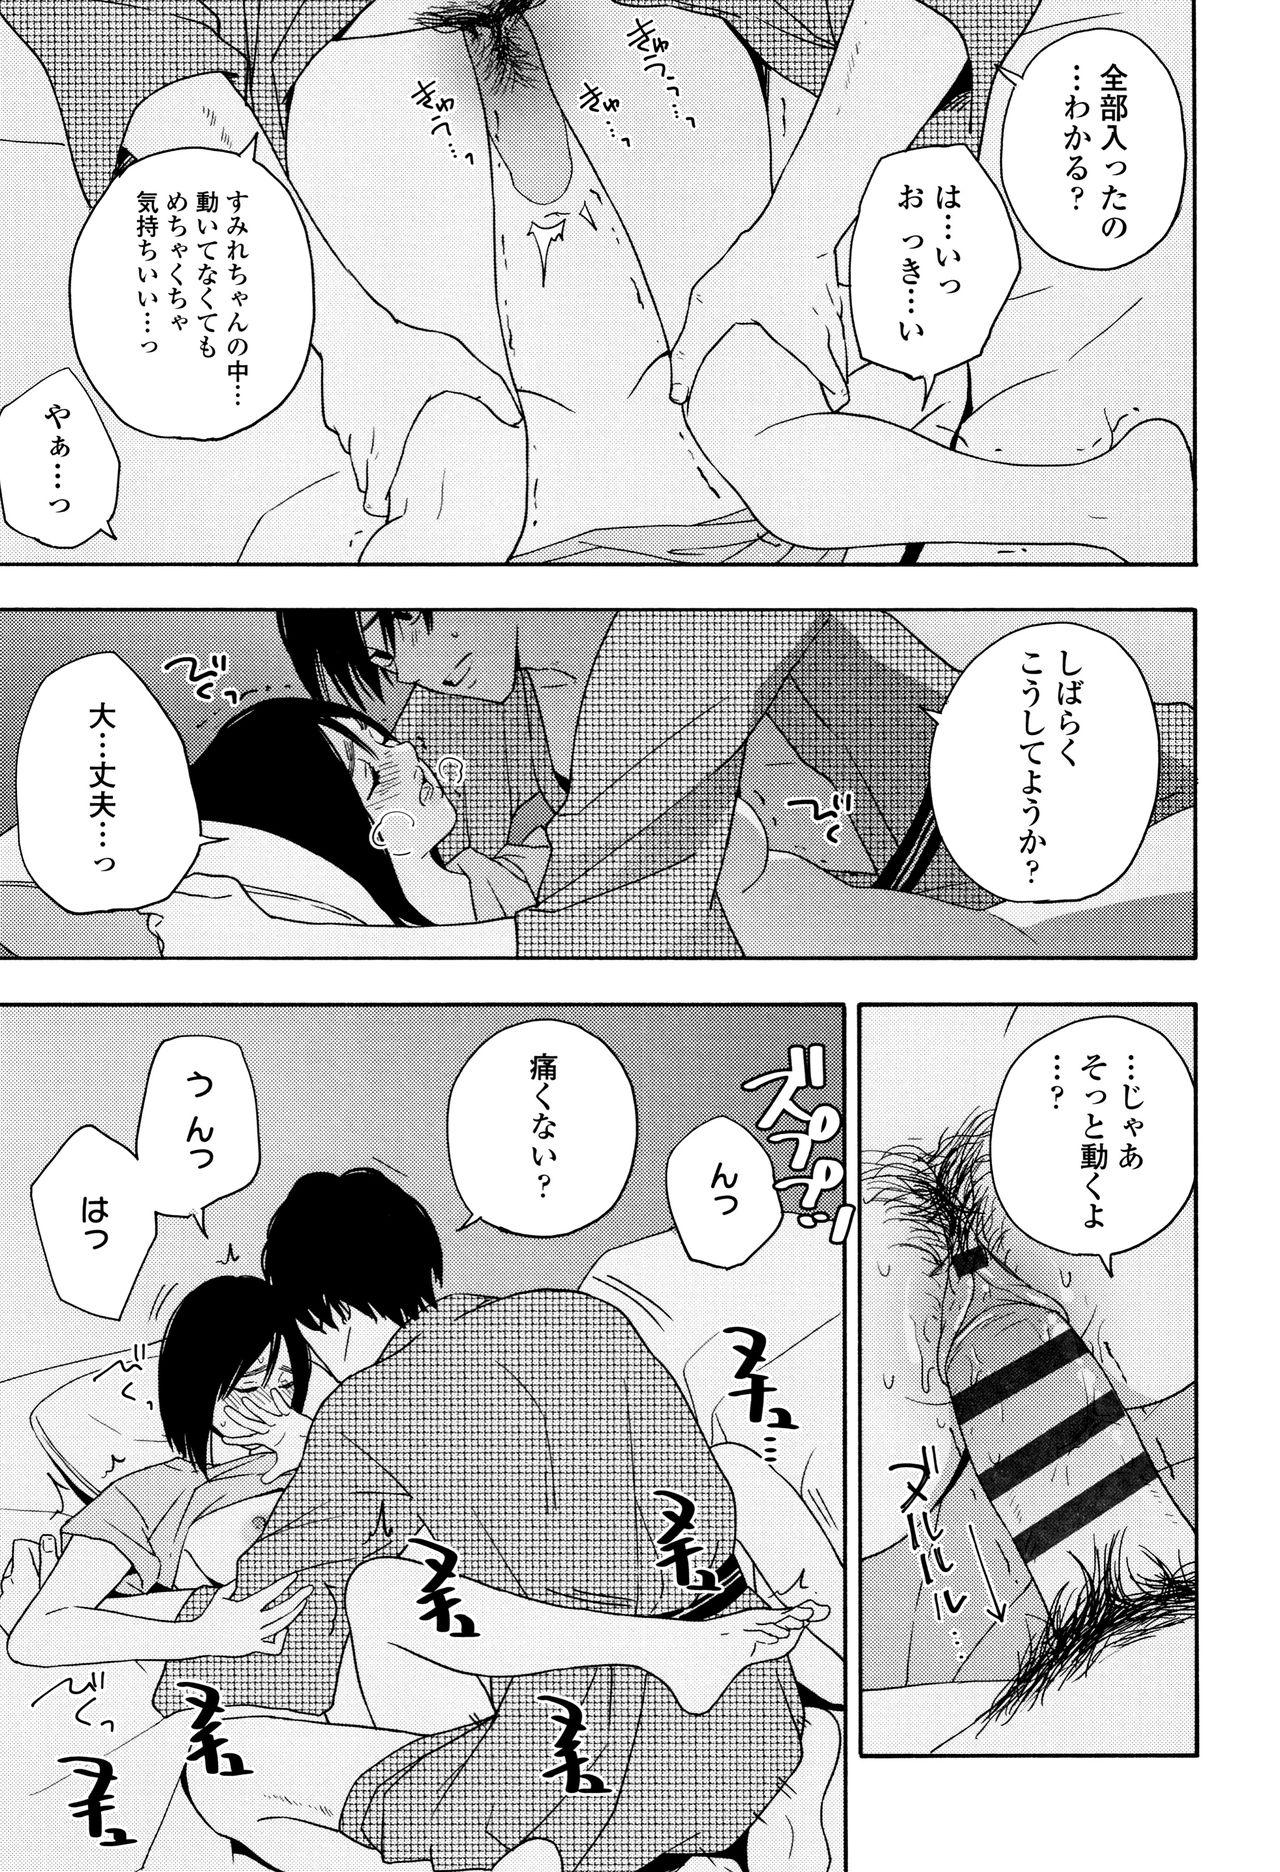 Shishunki no Eros - puberty eros 163